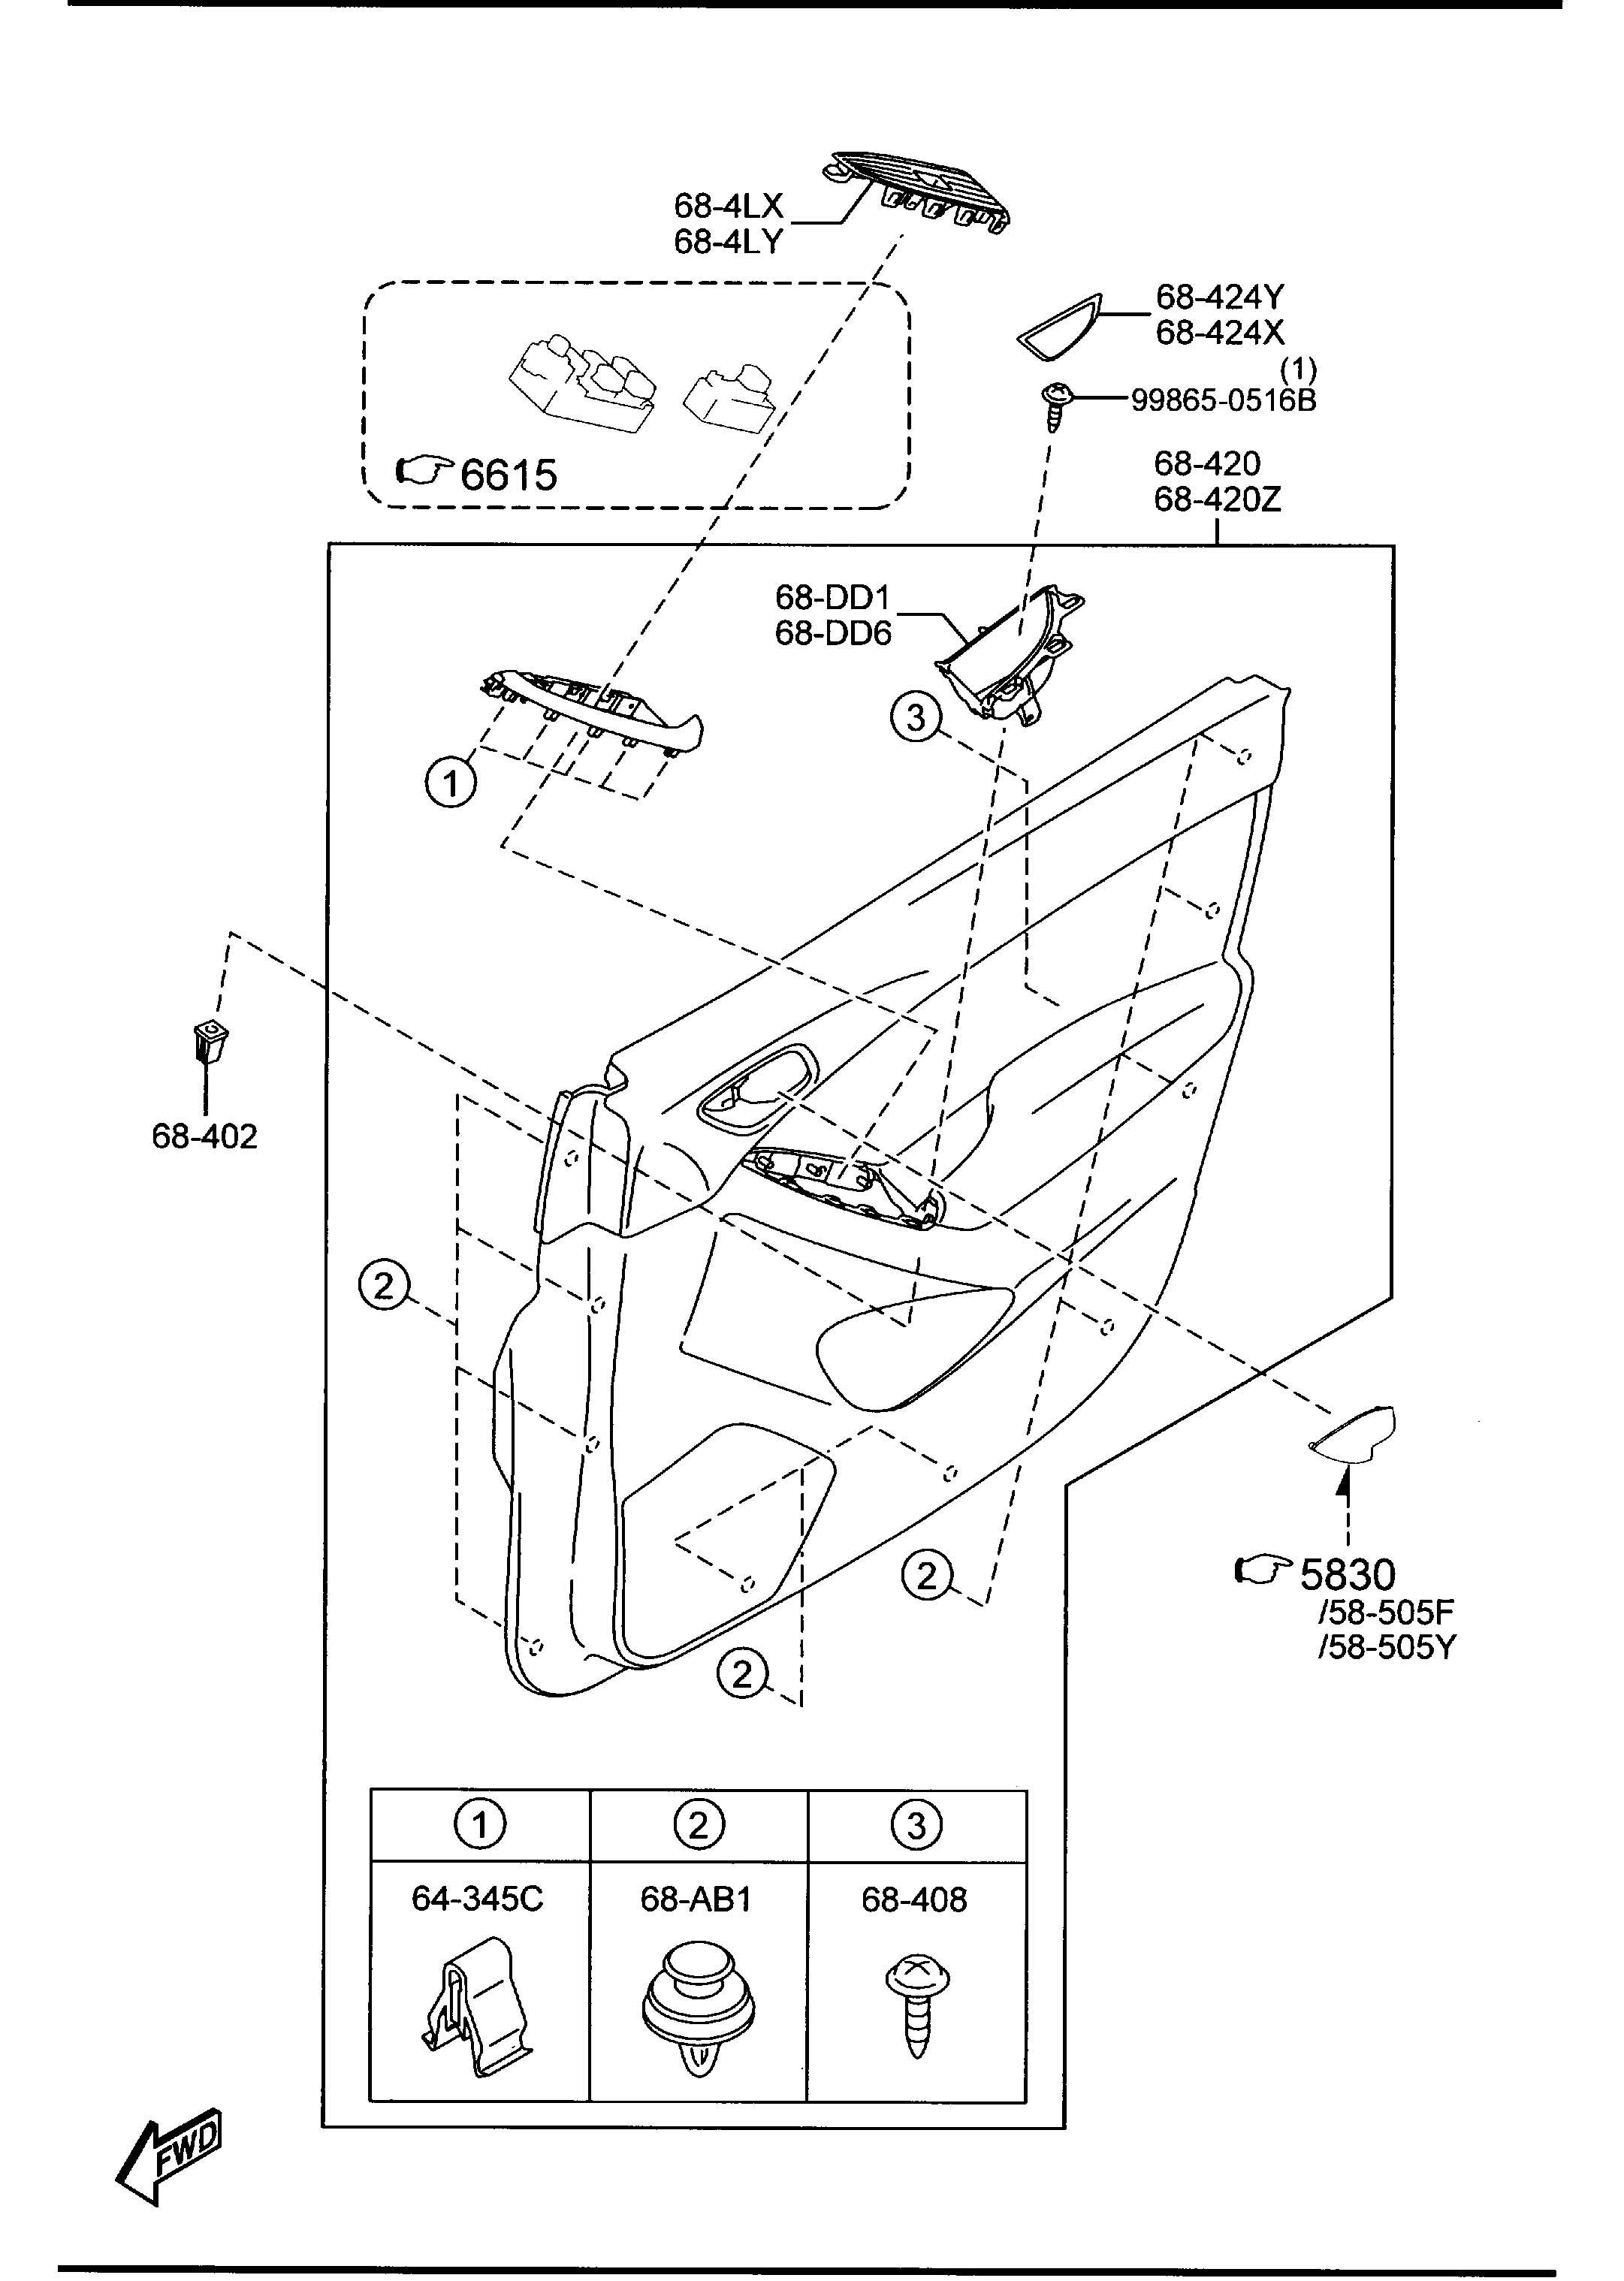 Mazda Cx 5 Fastener Panelfastener